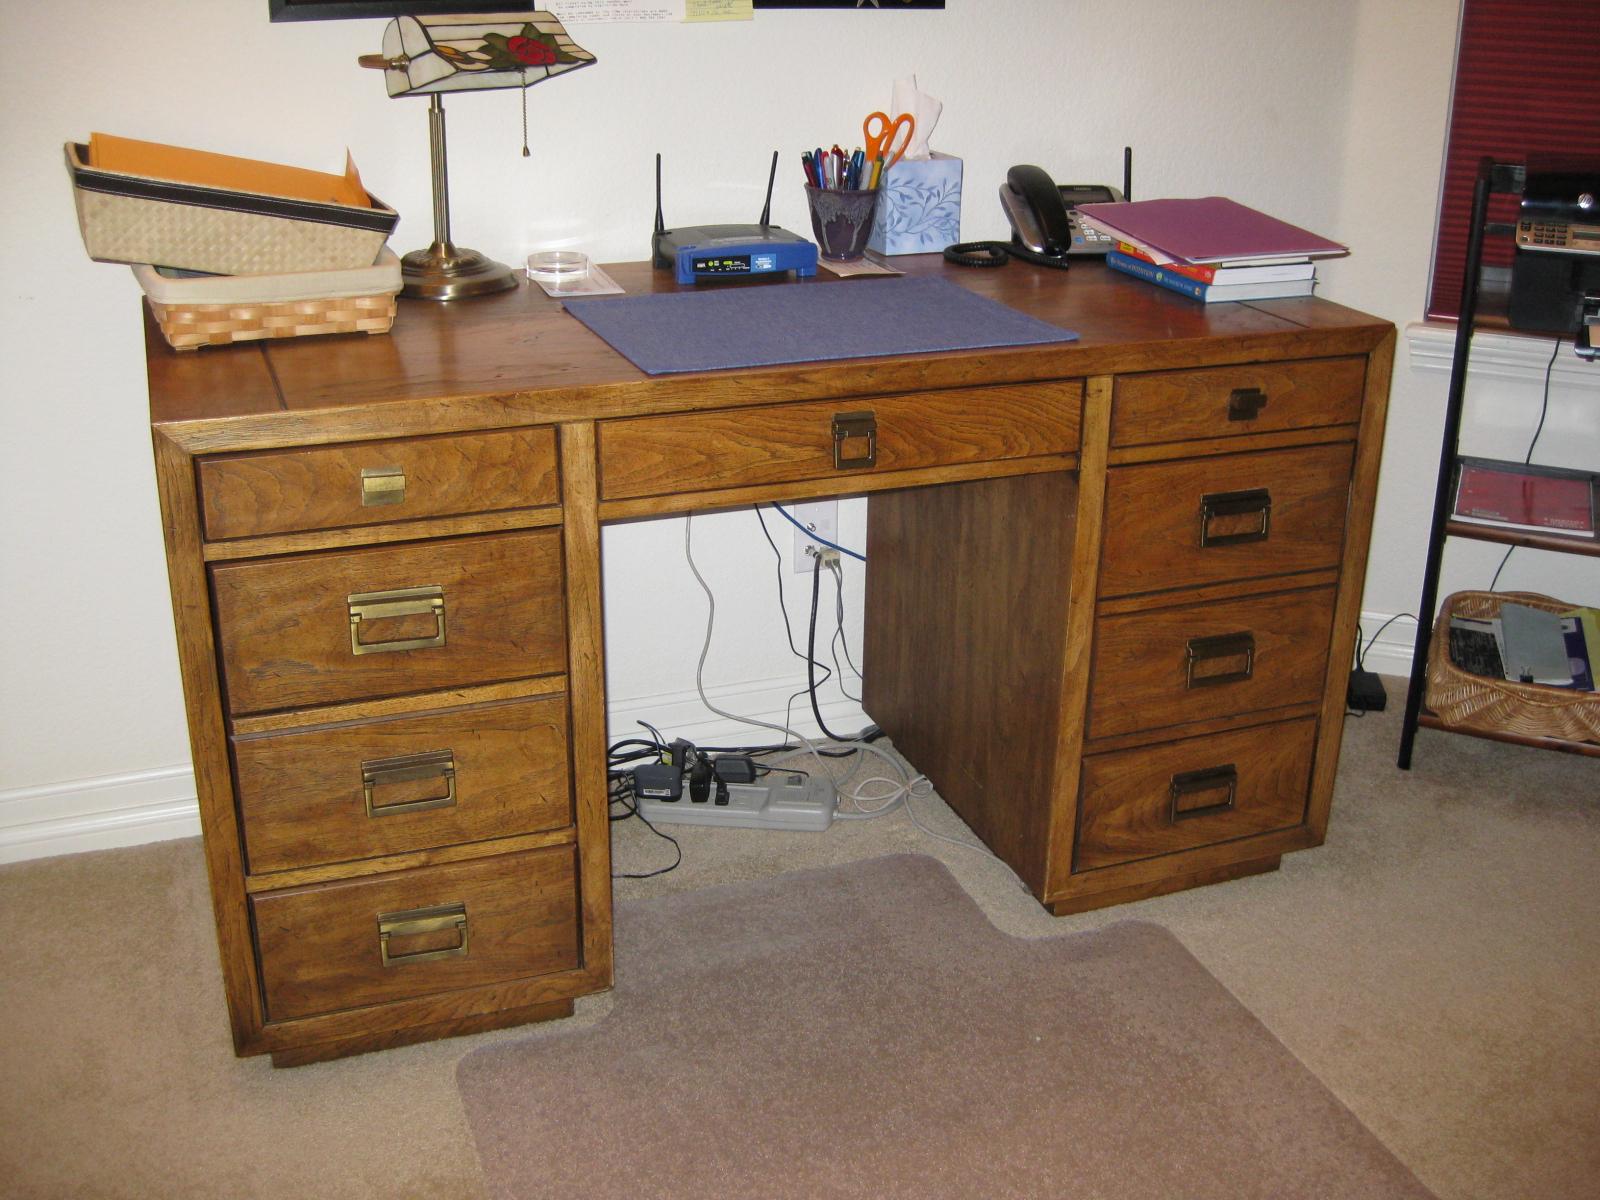 vintage drexel heritage furniture Drexel Heritage Furniture antique appraisal | InstAppraisal vintage drexel heritage furniture